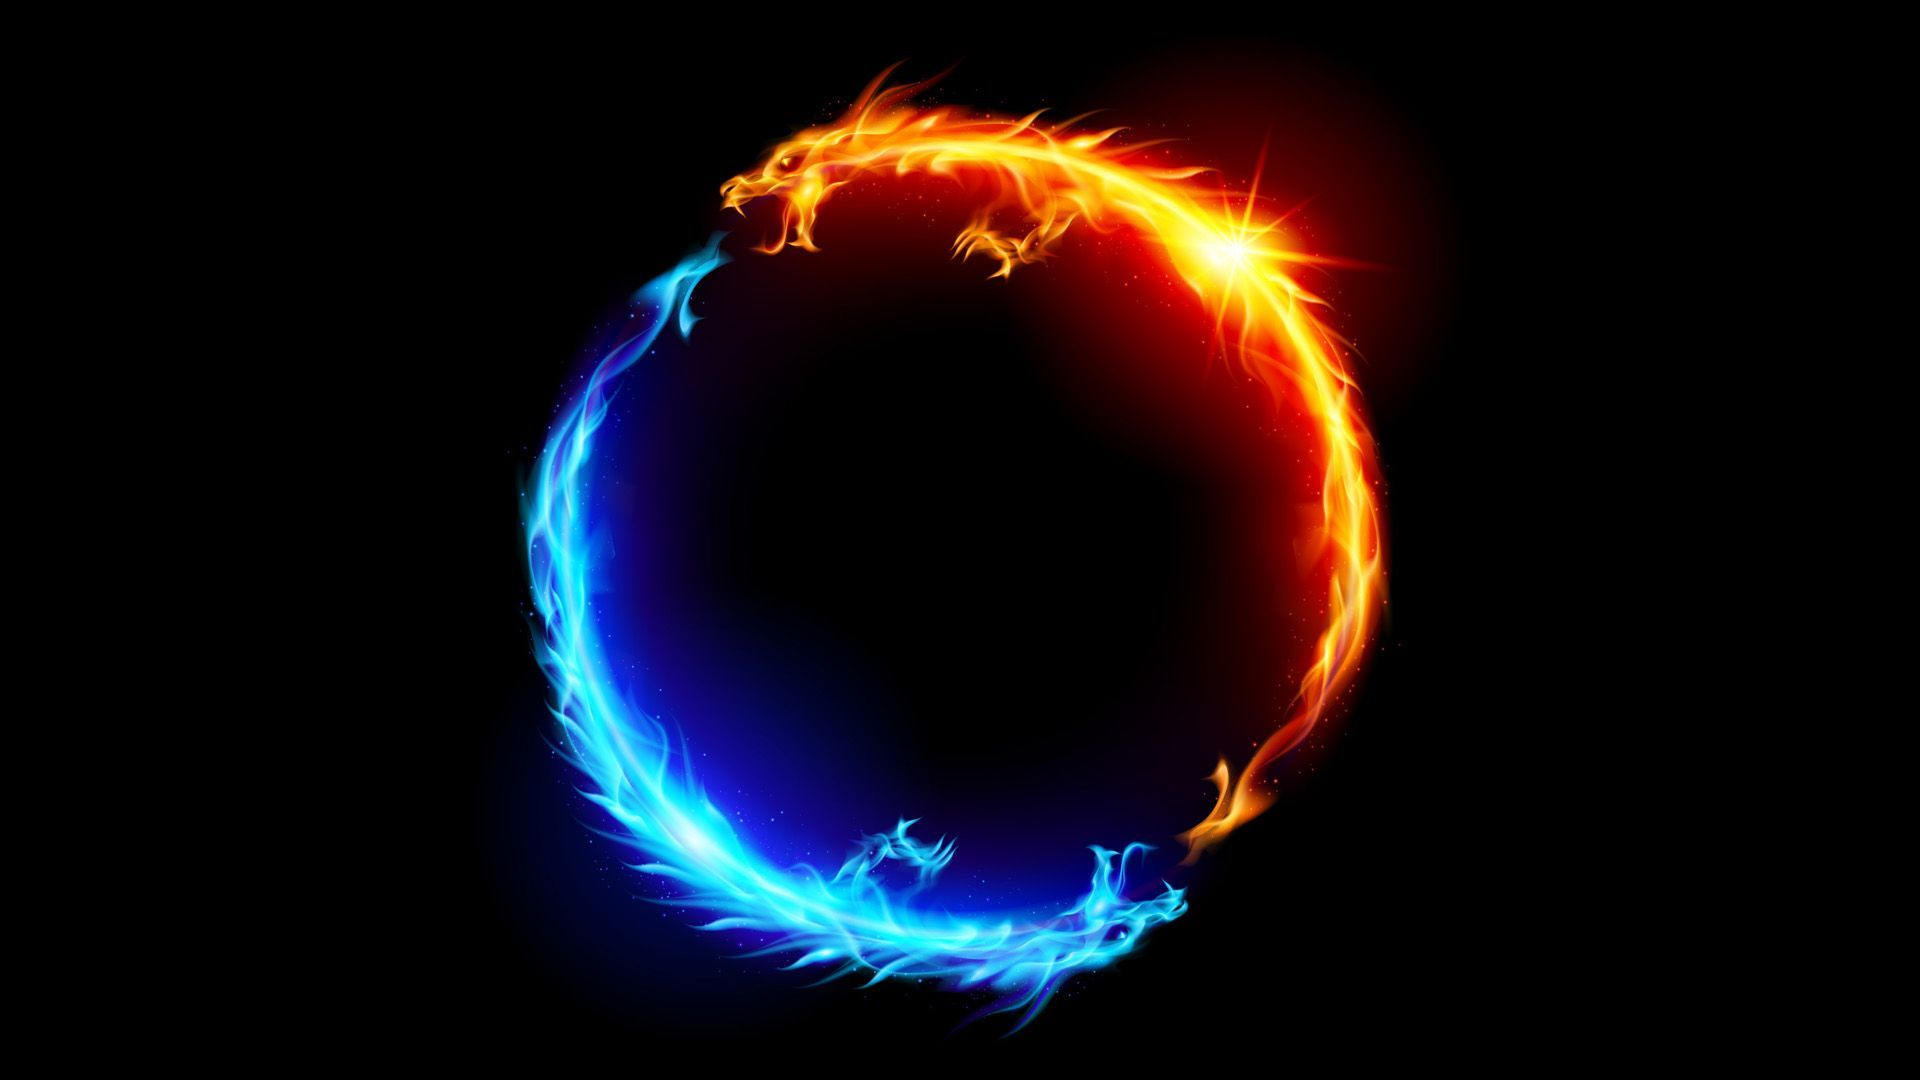 Flame Dragon iPhone Wallpaper